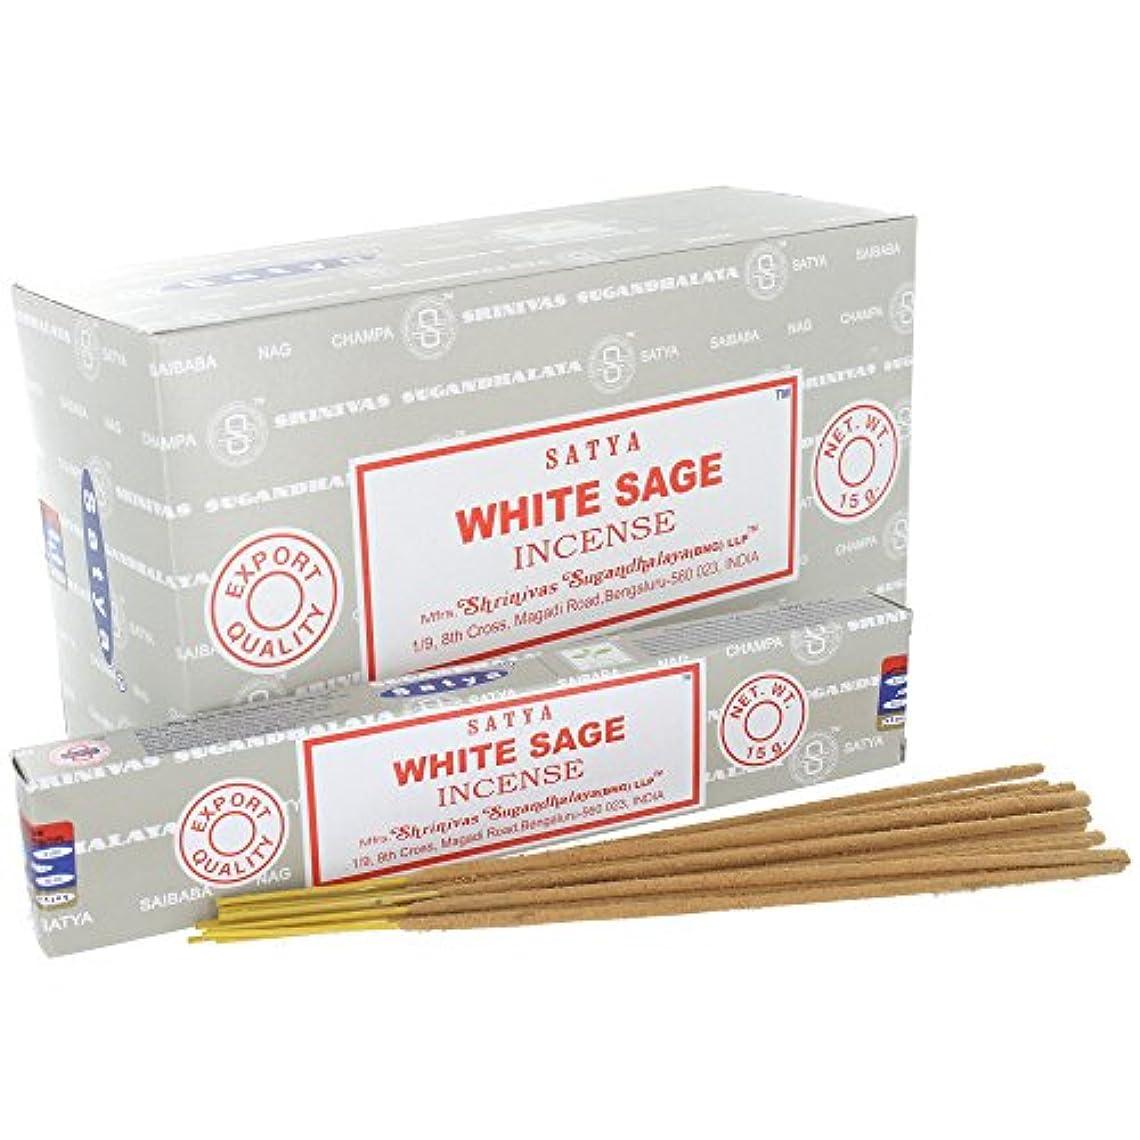 印象的緊急主権者Satya White Sage Incense Sticks (Box) 15g X 12 = 180g